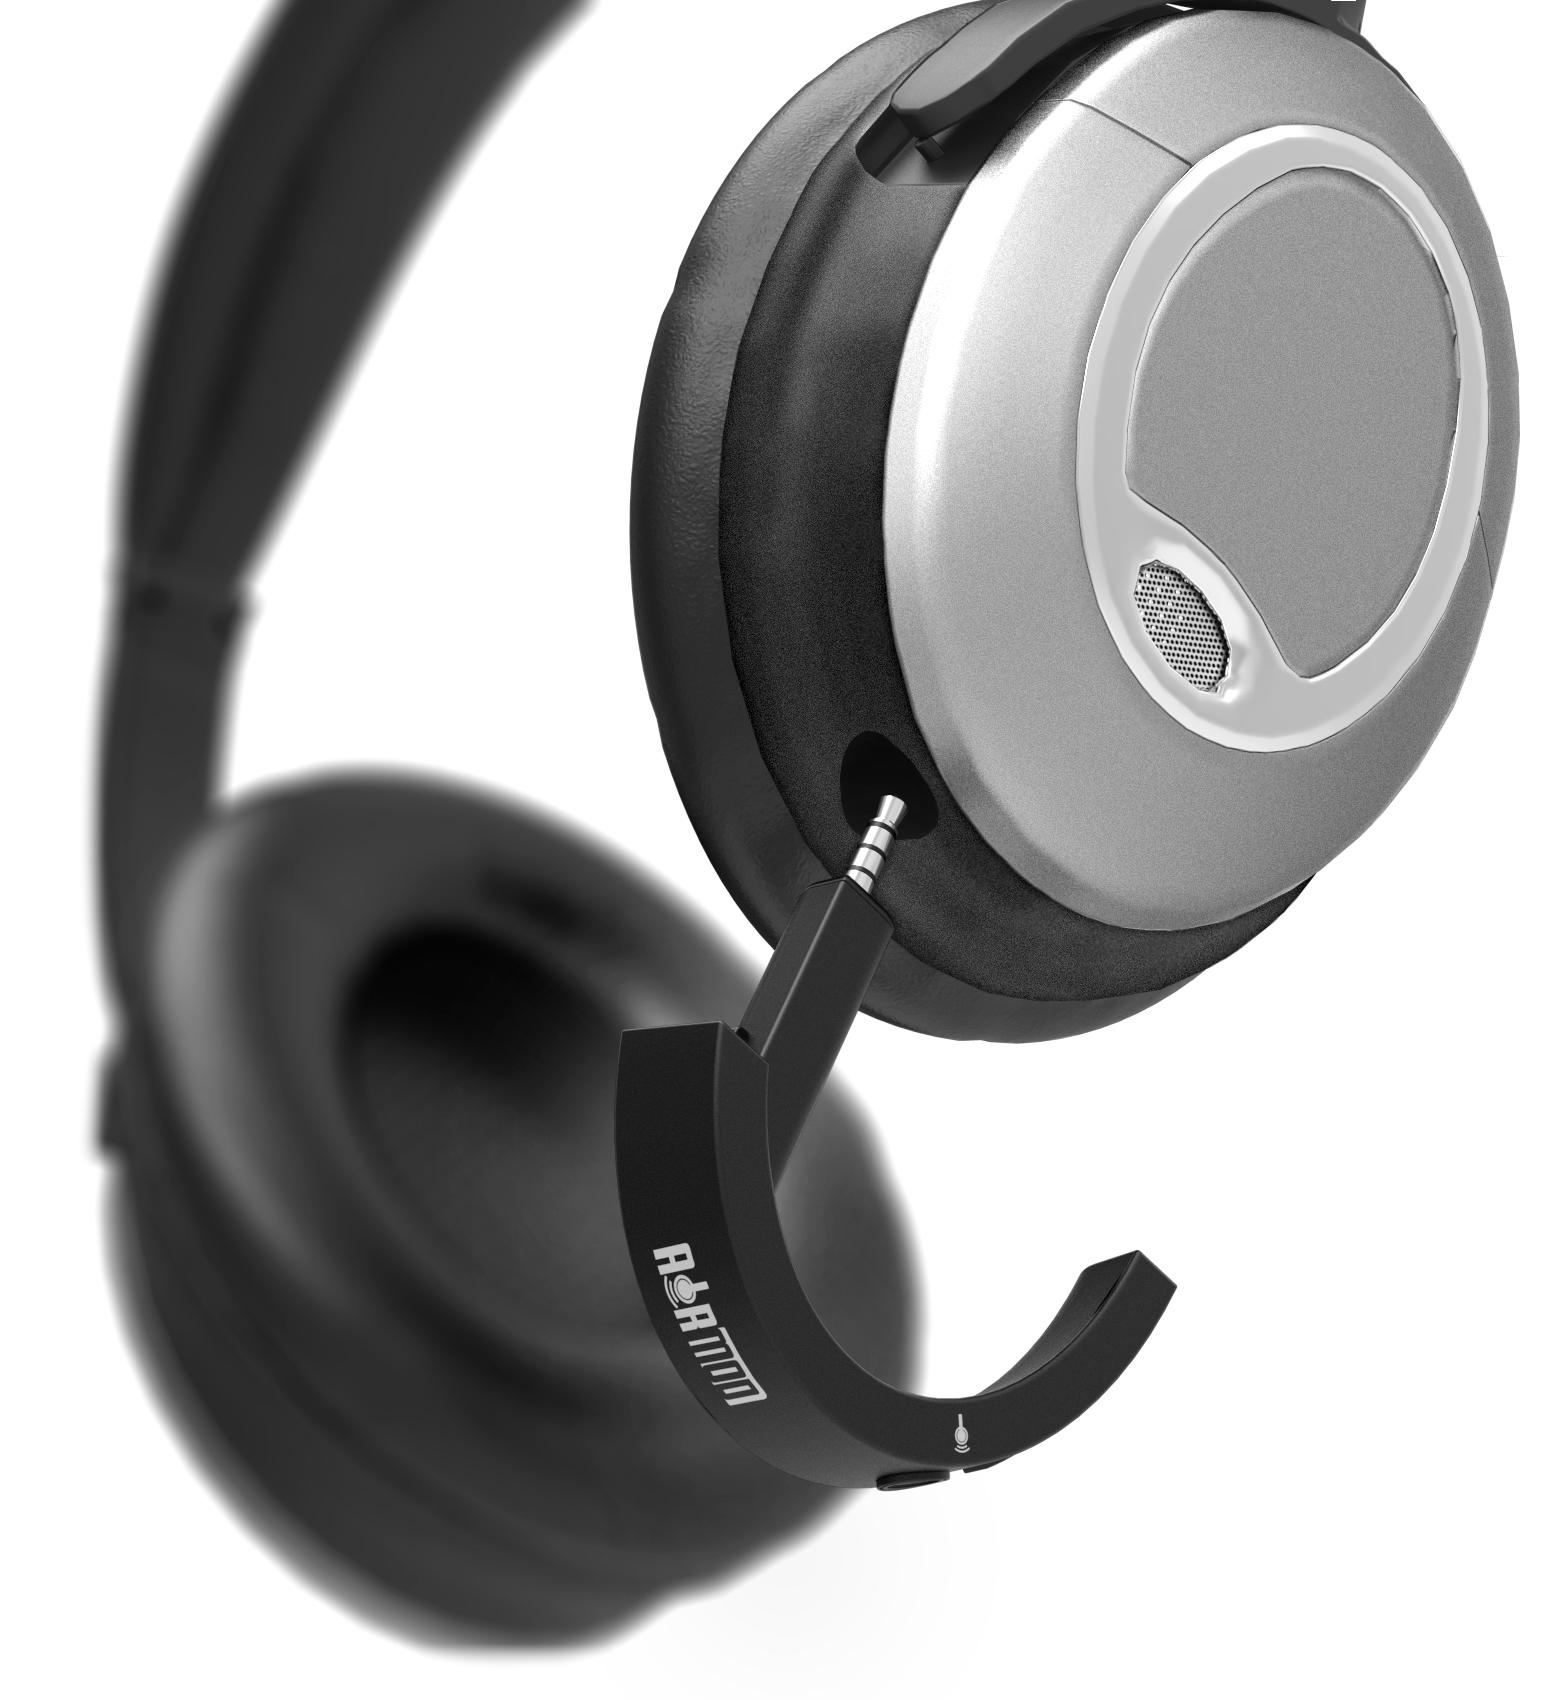 AirMod Wireless Bluetooth Adapter for Bose QuietComfort 15 Headphones (QC15) 742415434765 | eBay